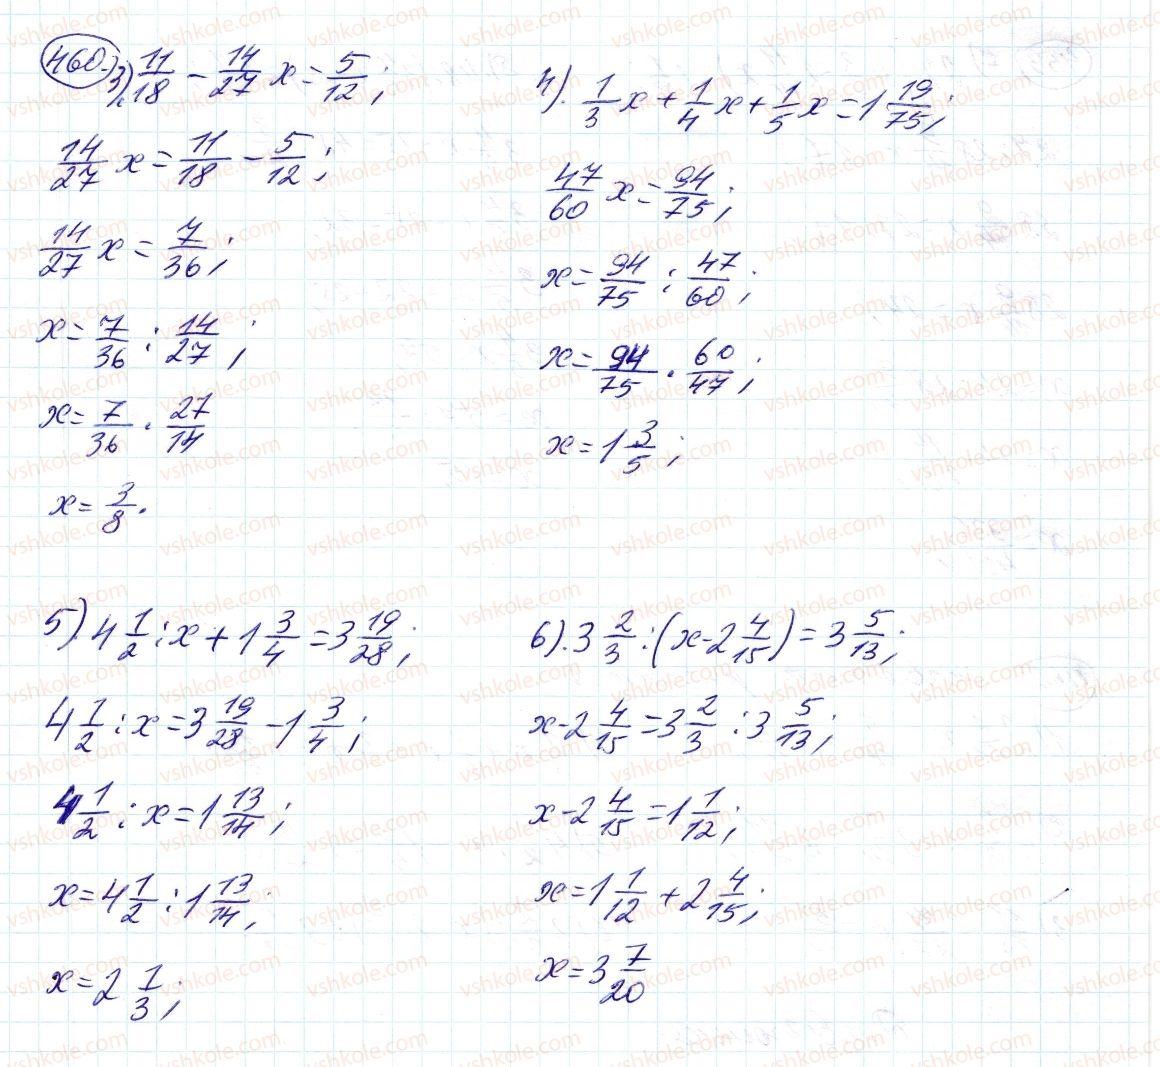 6-matematika-ag-merzlyak-vb-polonskij-ms-yakir-2014--2-zvichajni-drobi-14-dilennya-drobiv-460-rnd1807.jpg